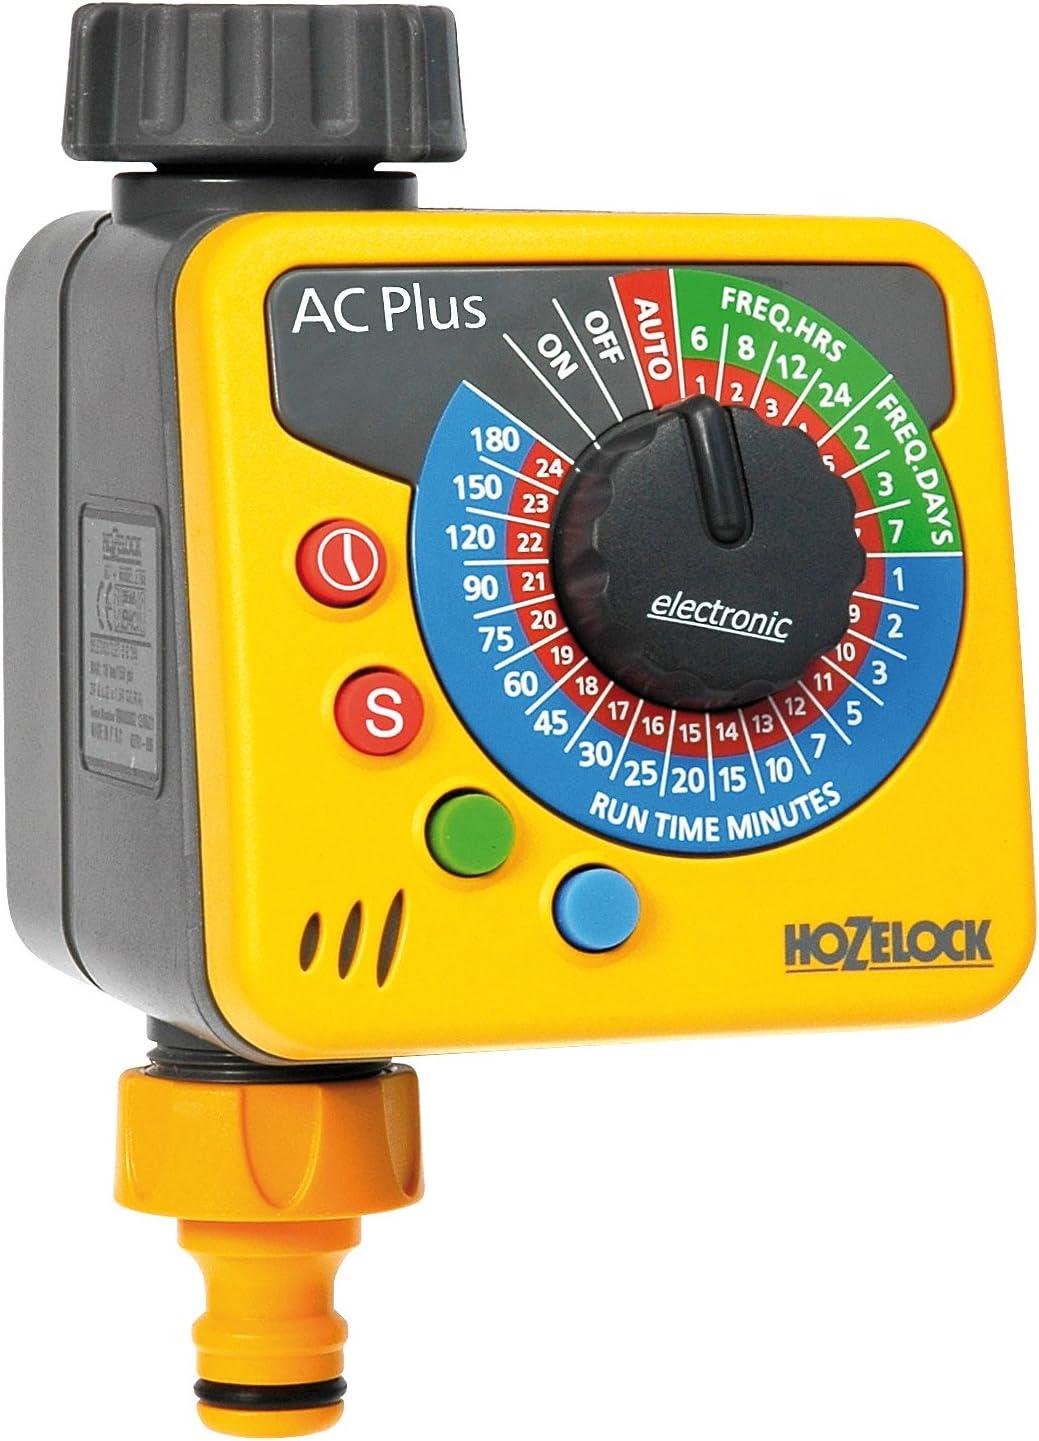 Hozelock - Programador de riego electrónico AC Plus de muy fácil programación